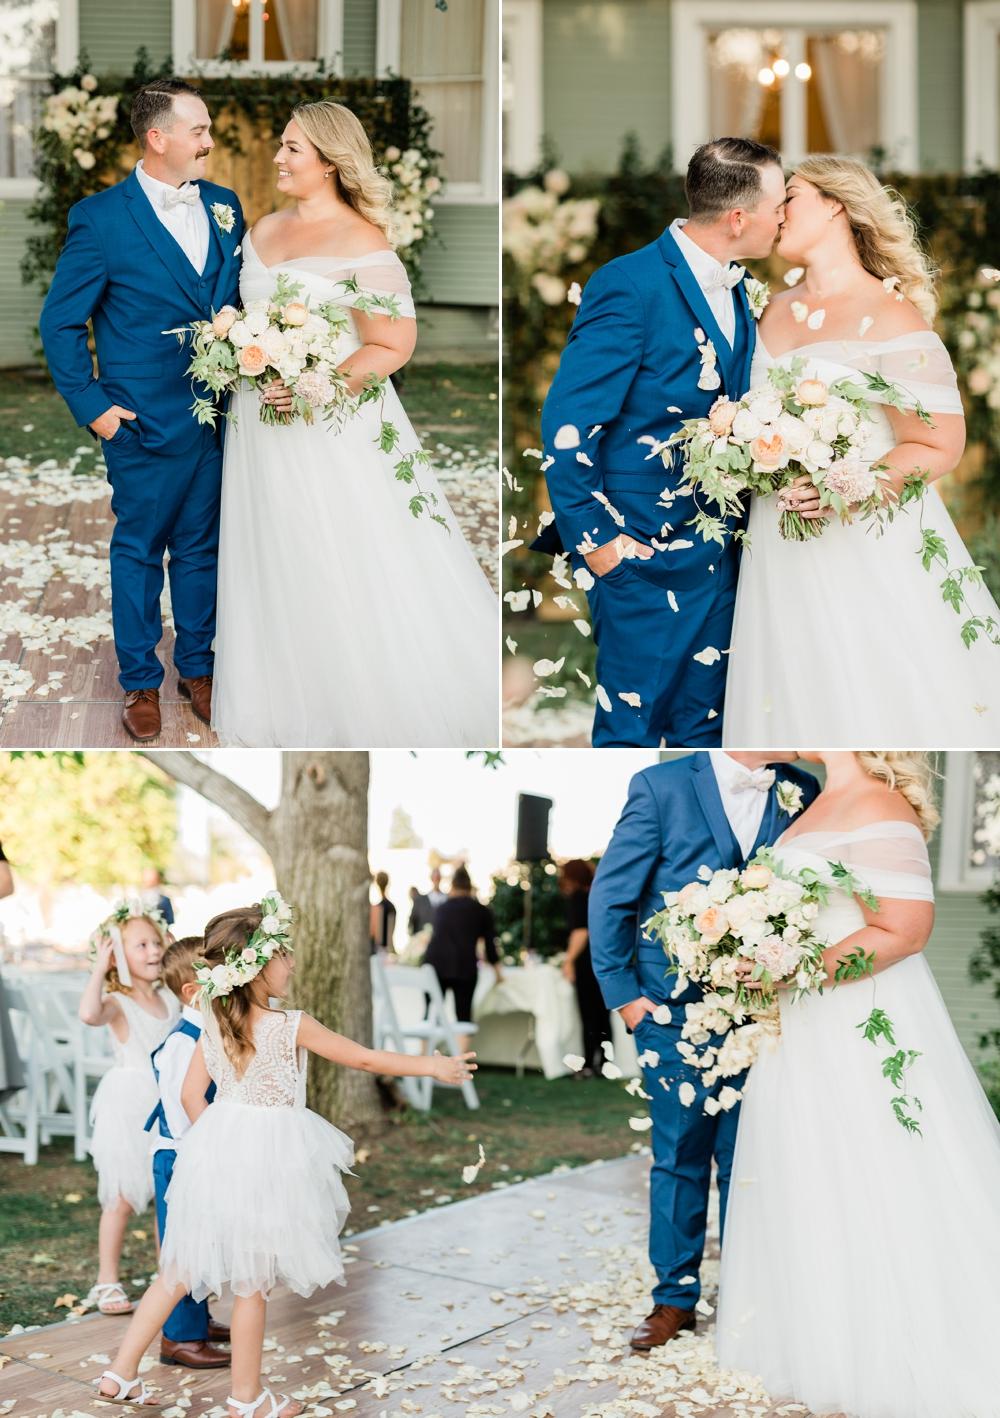 romantic wedding portraits, golden hour portraits, bride and groom portraits, just married